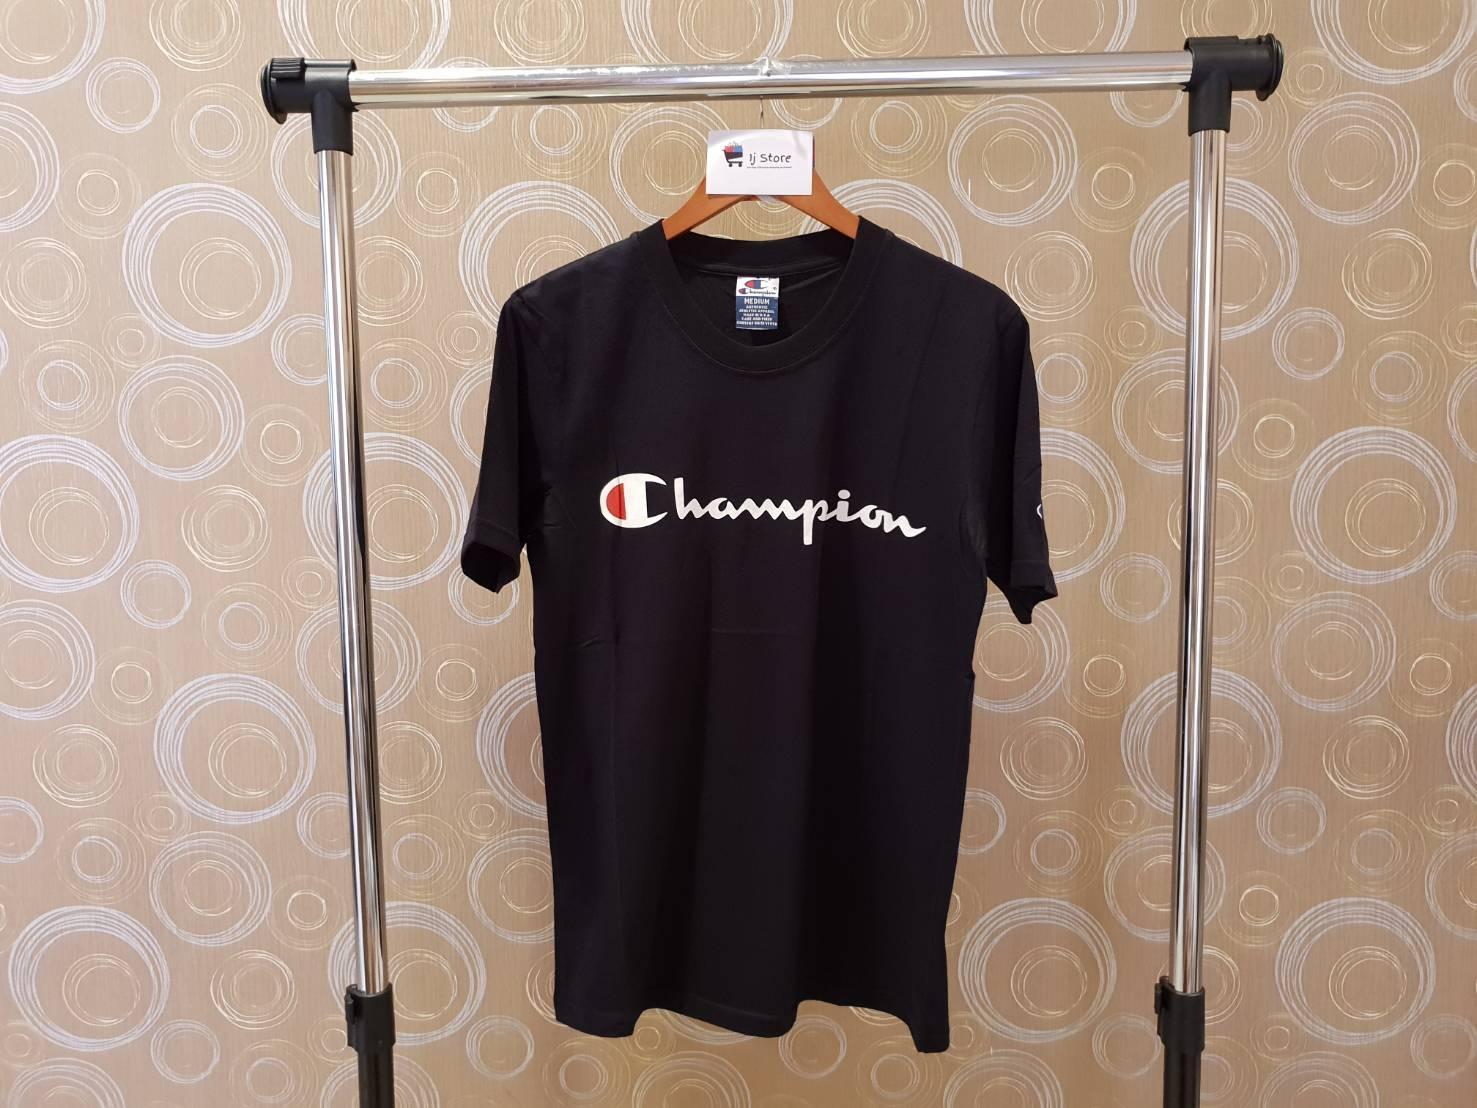 a74c1b681a4f Kaos champion logo import distro high quality hitam unisex